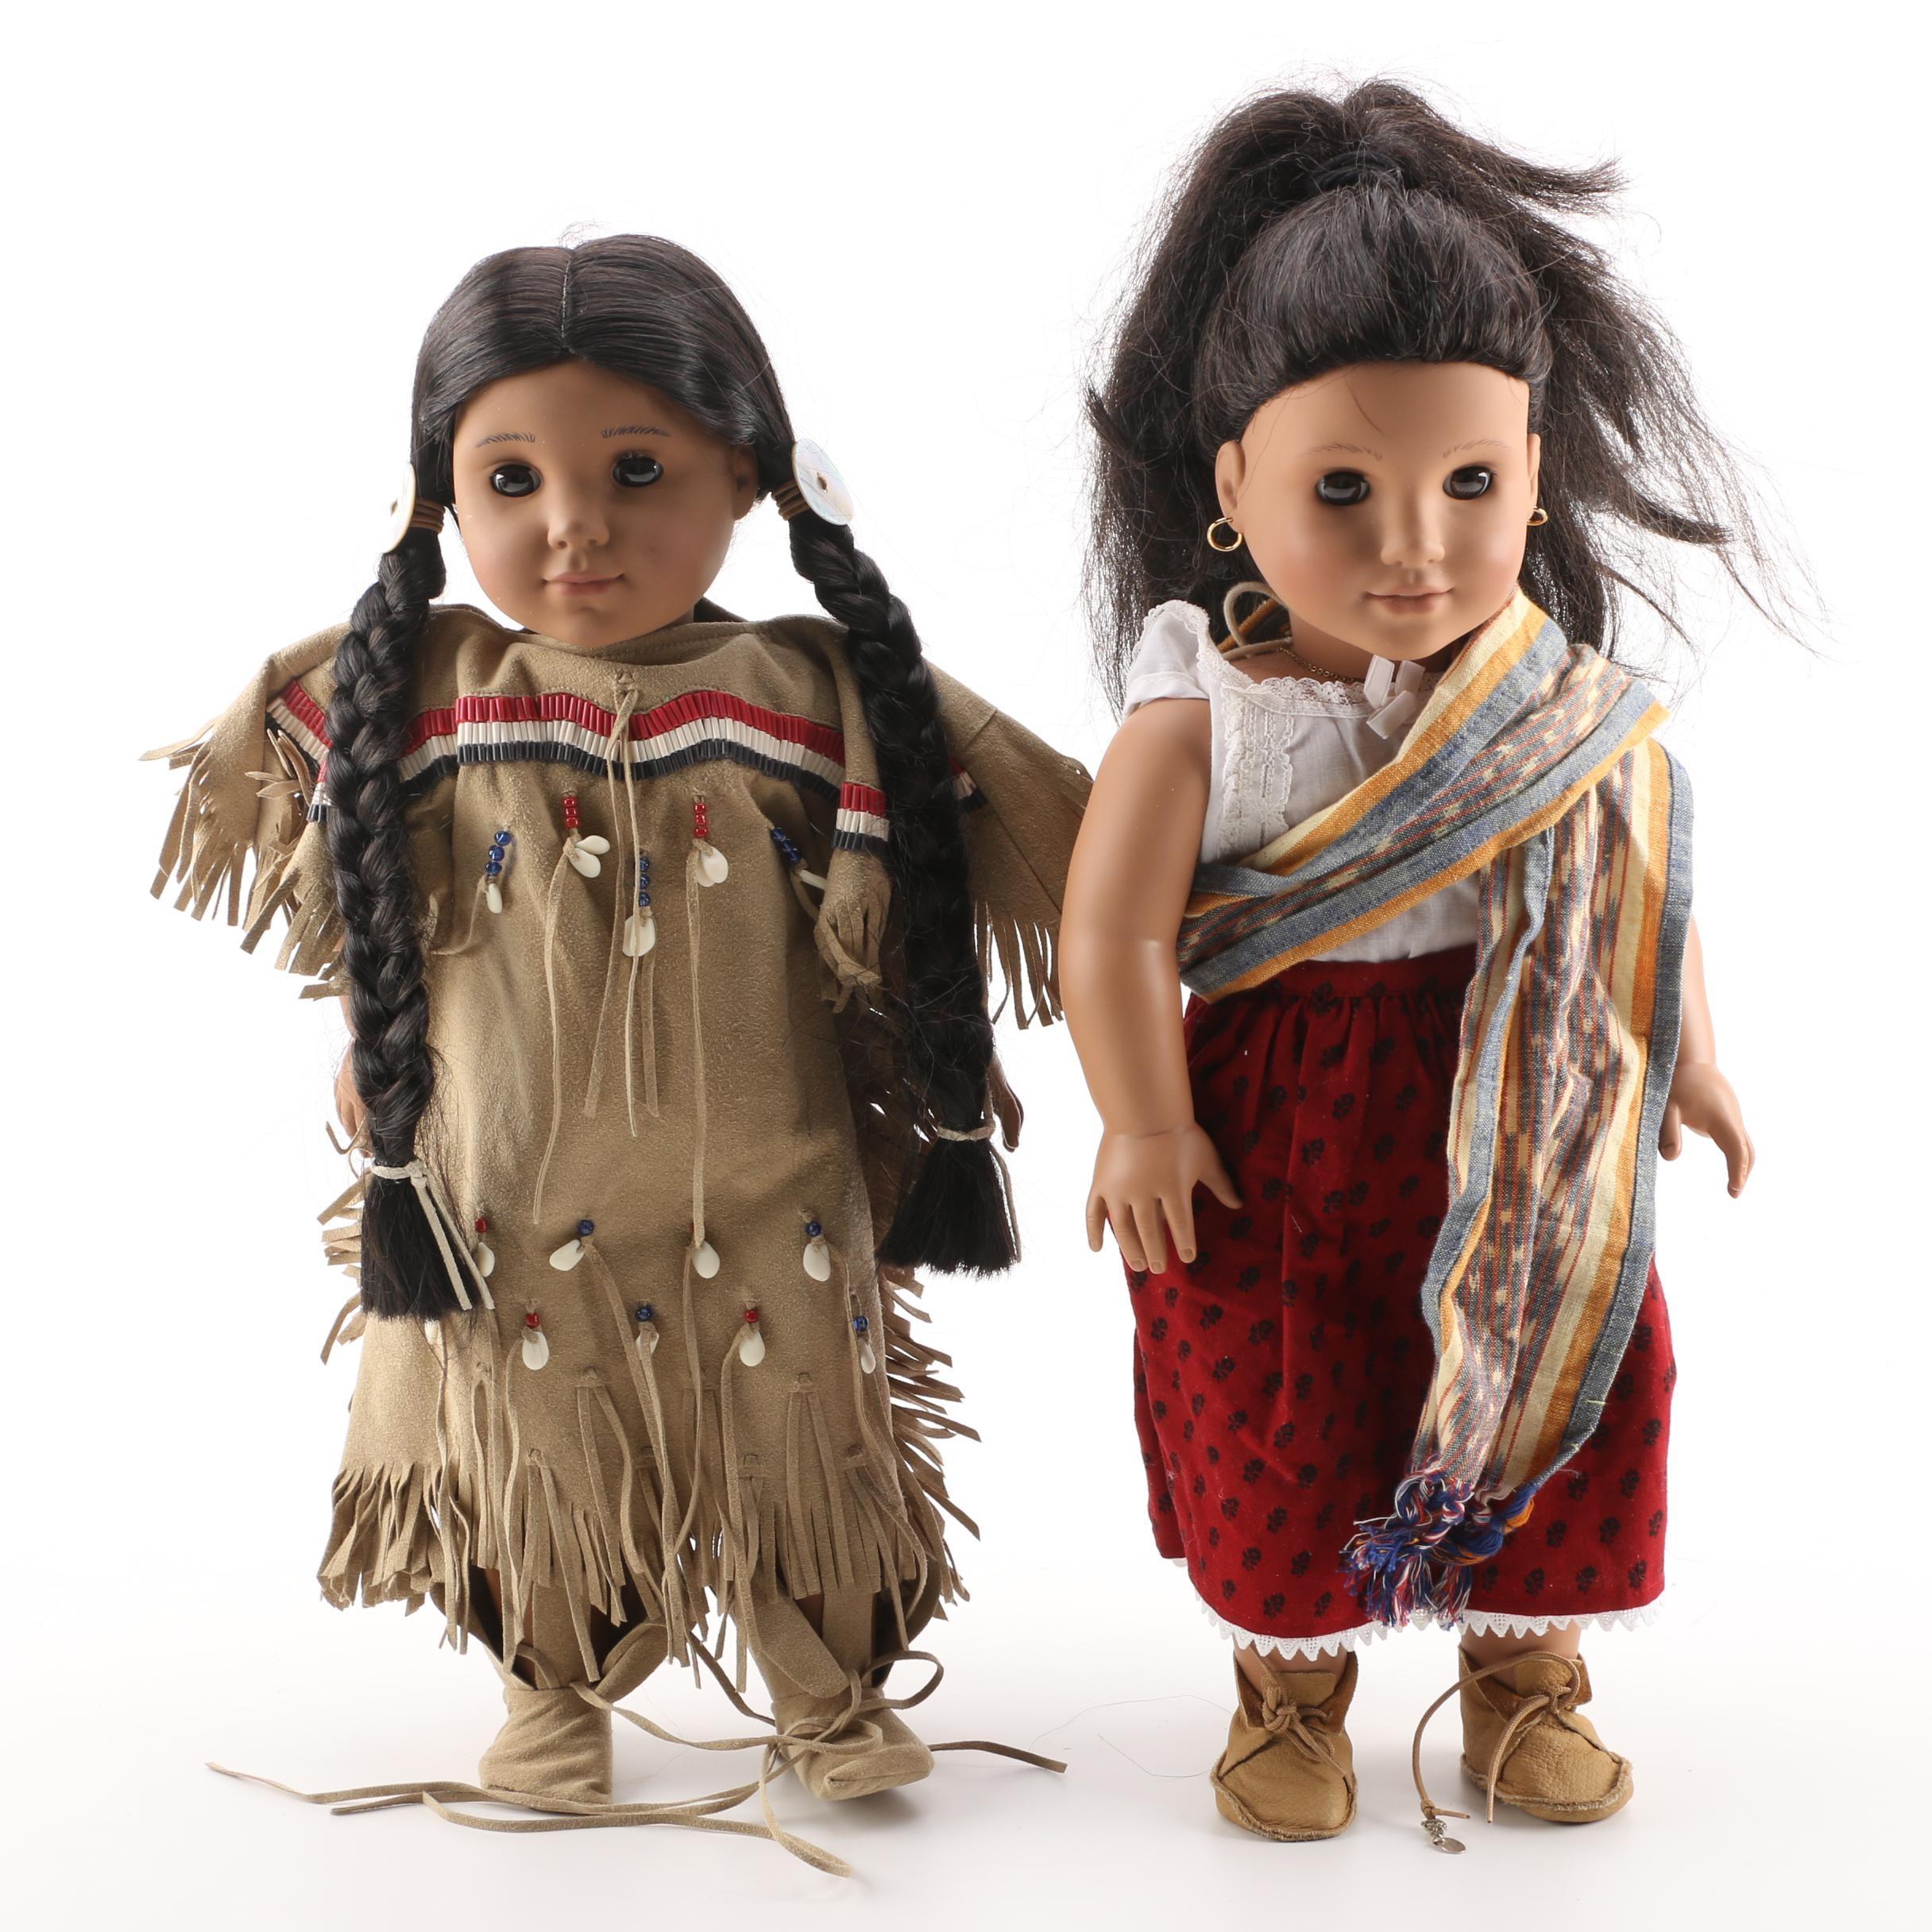 "American Girl ""Kaya"" and Josefina"" Dolls"